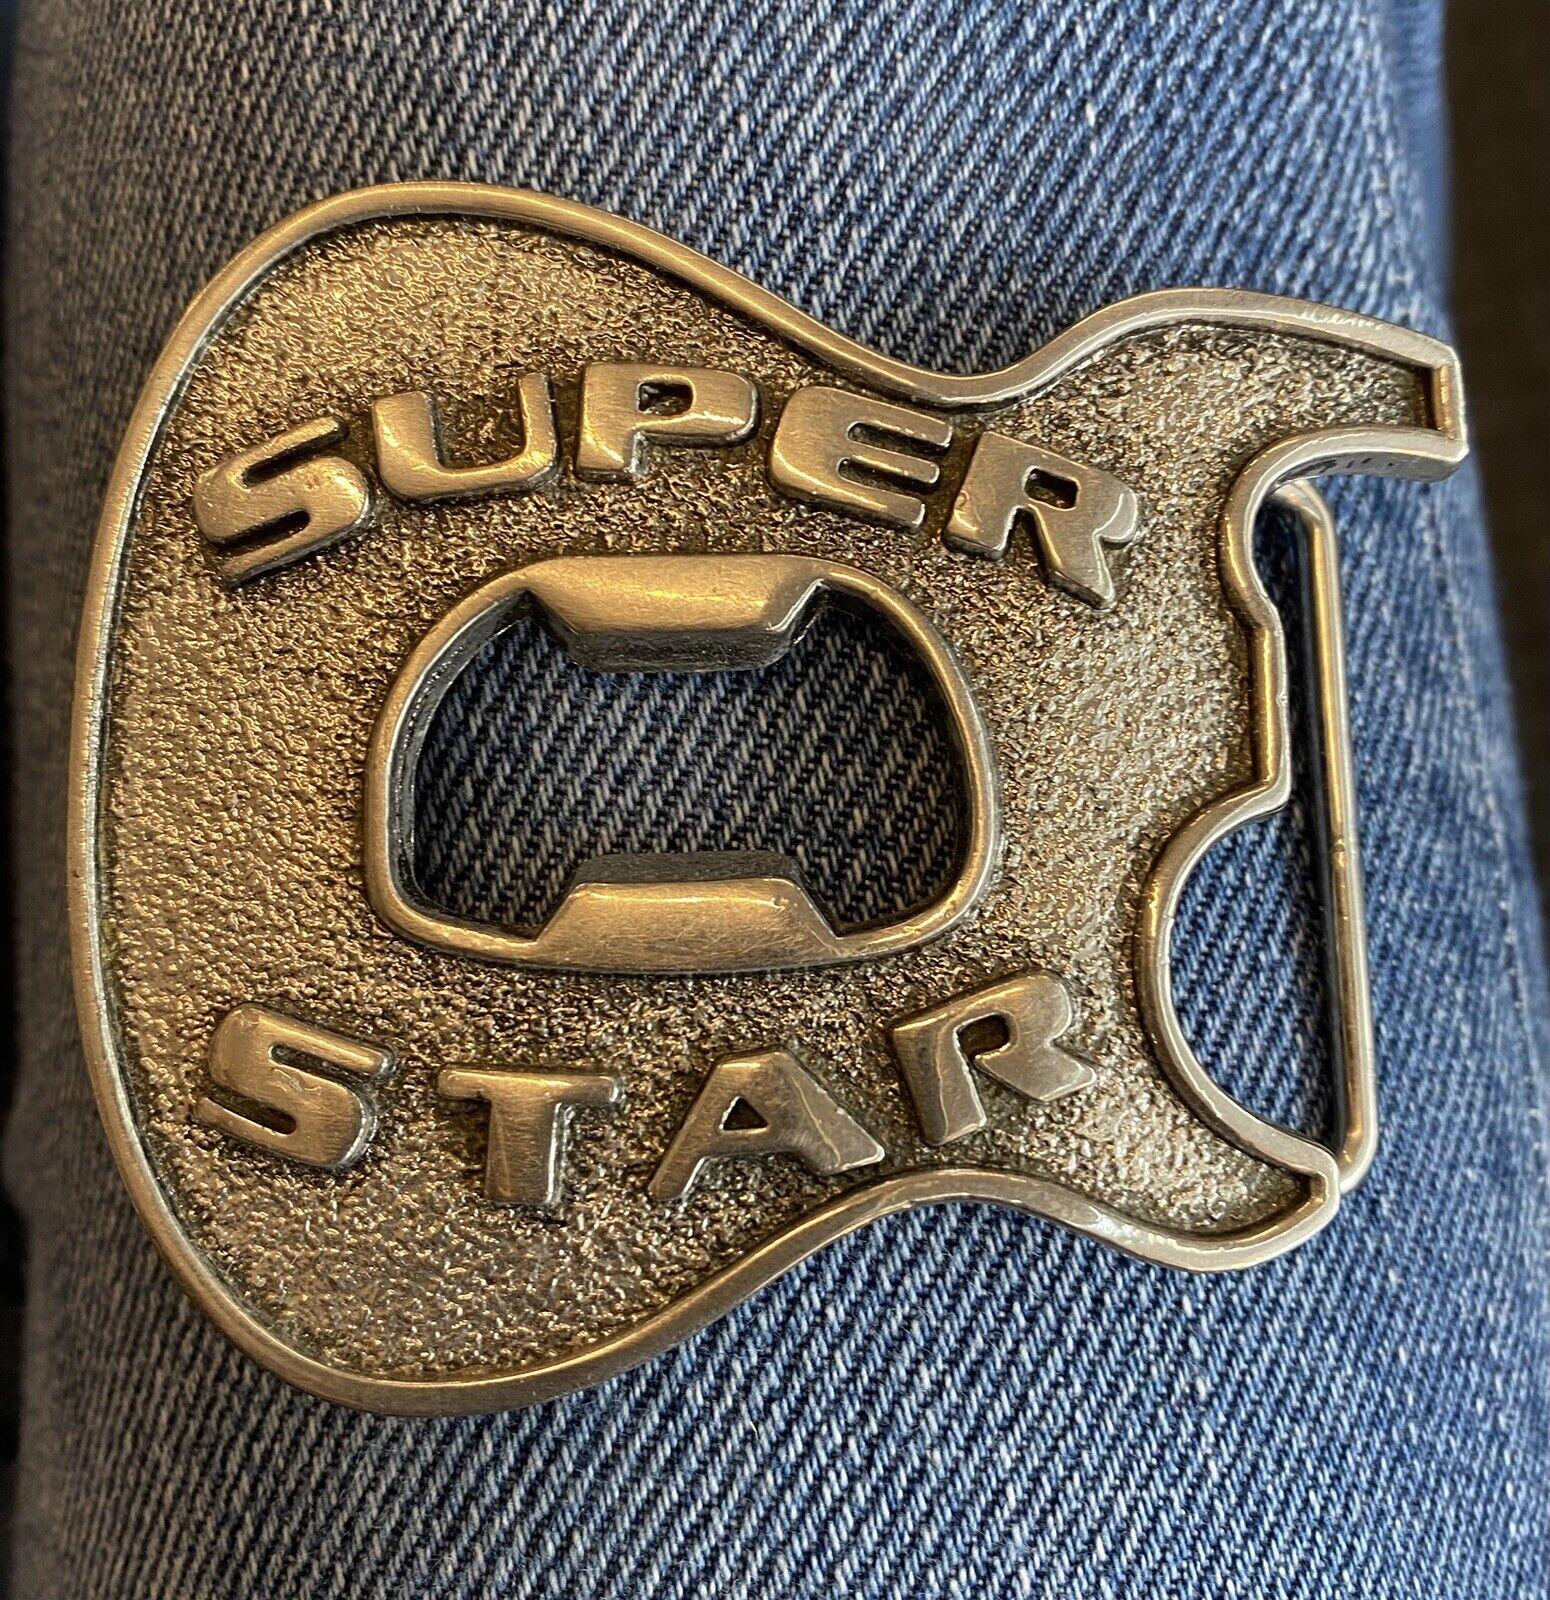 Super Star music belt buckle bottle opener in the centre.